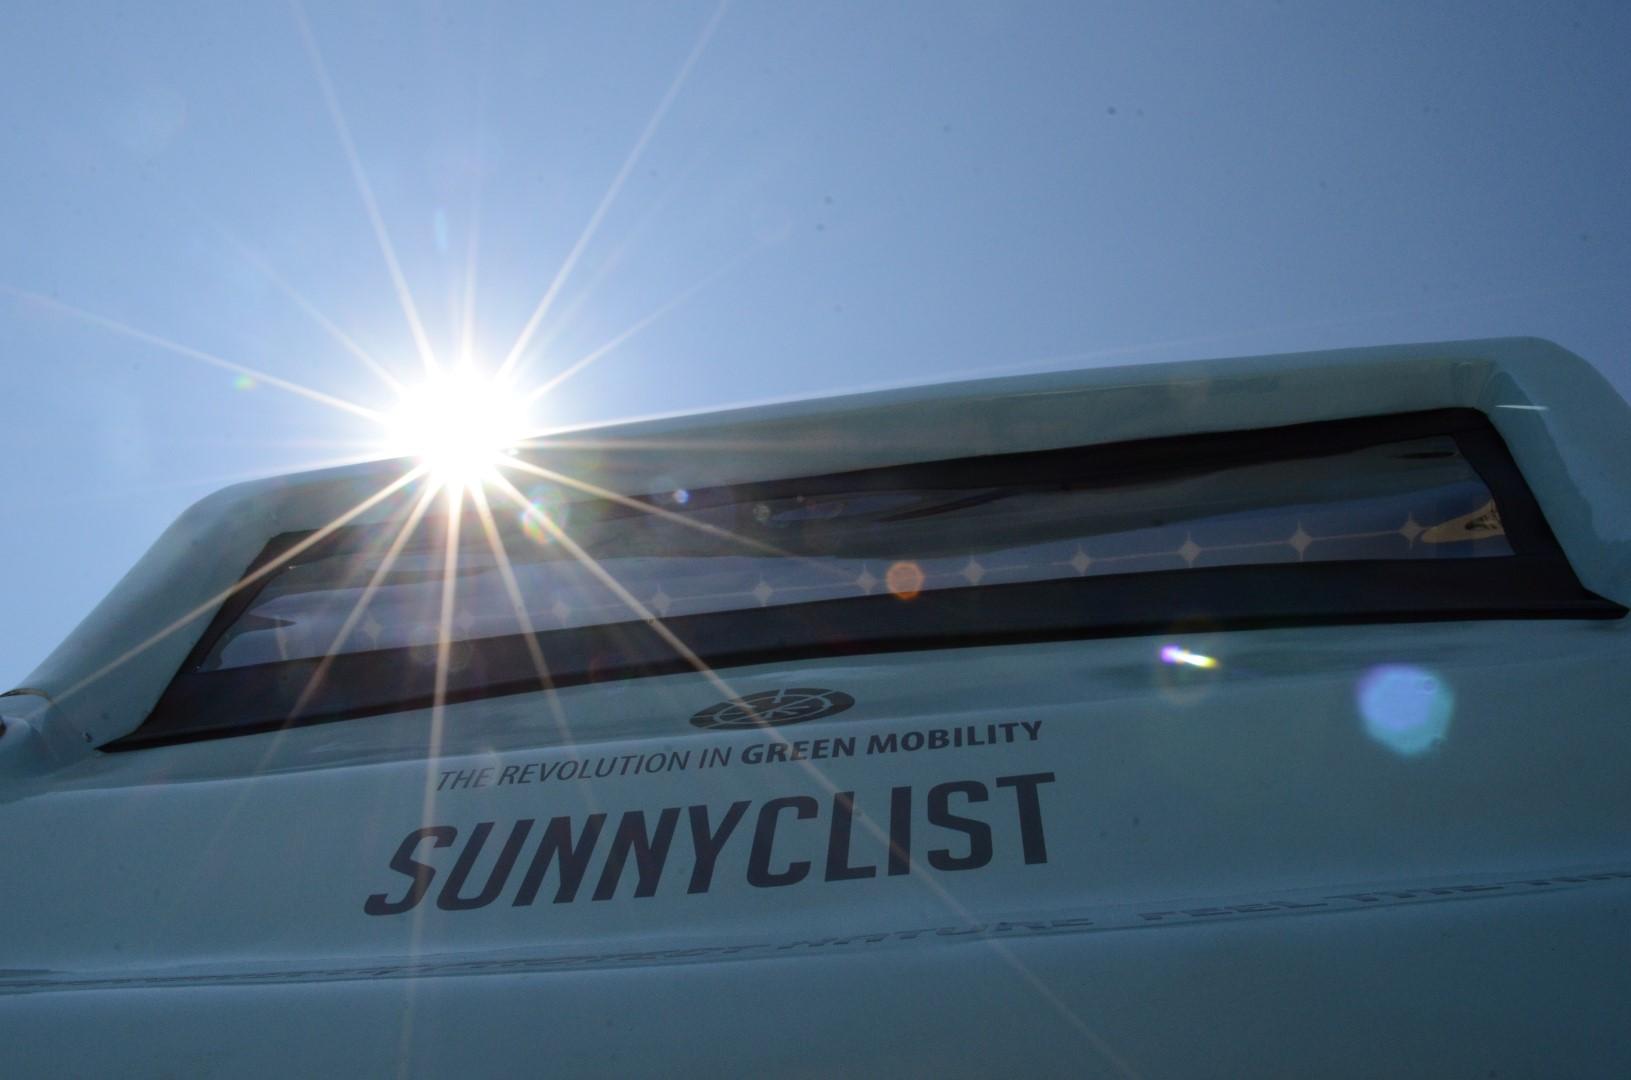 Sunnyclist Hybrid electro solar green vehicle